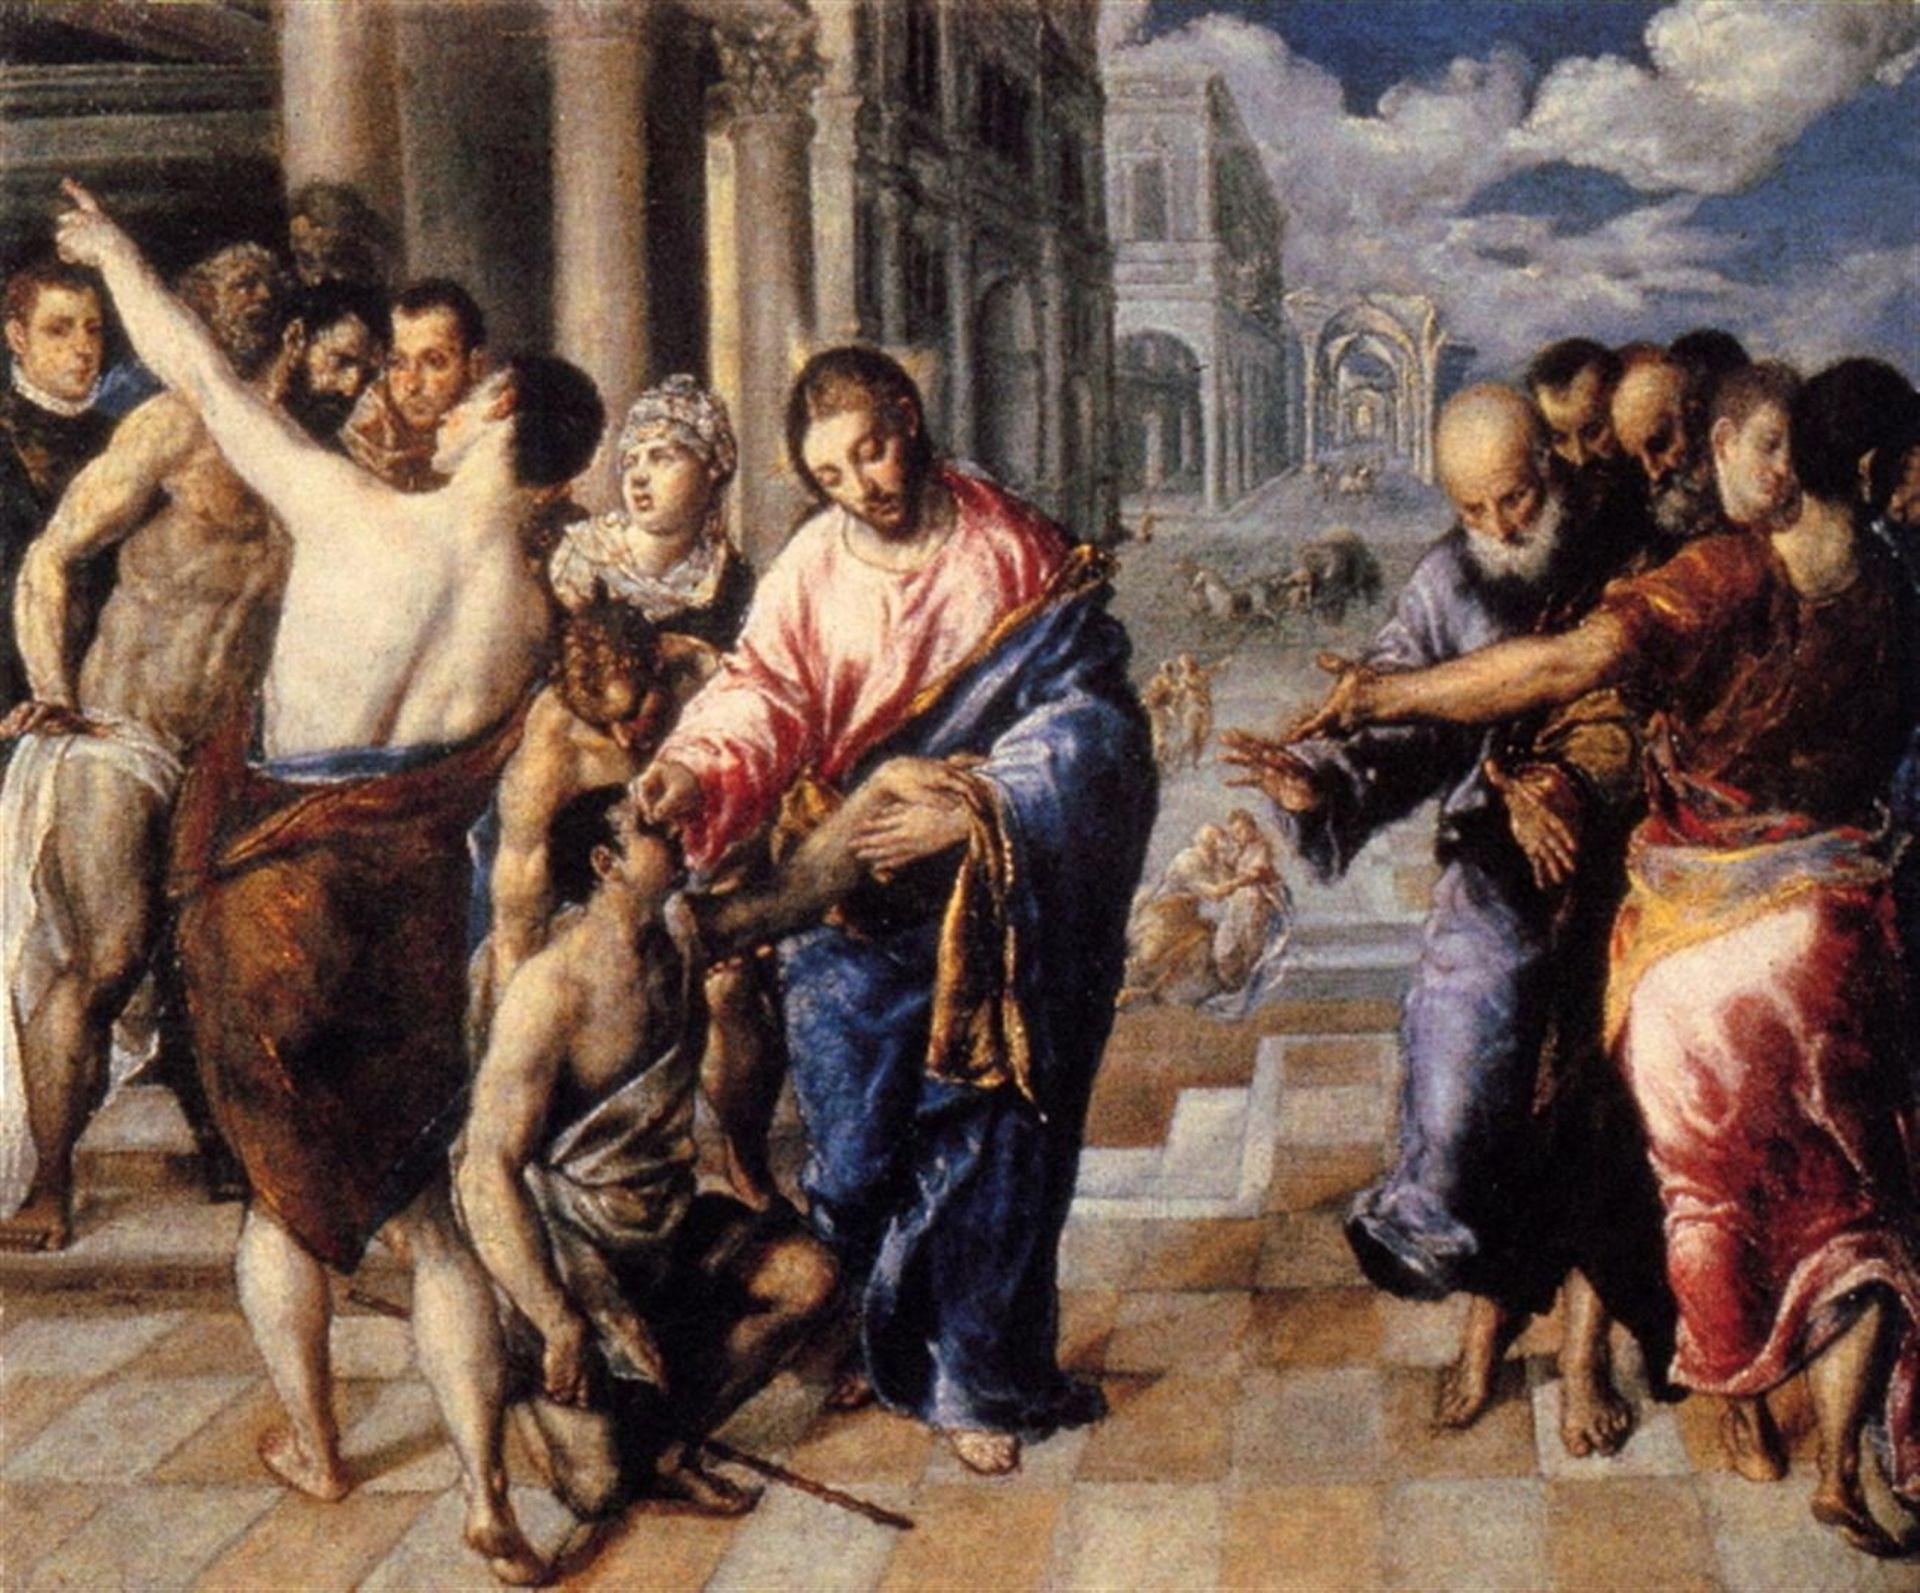 El Greco - Christ Healing the Blind